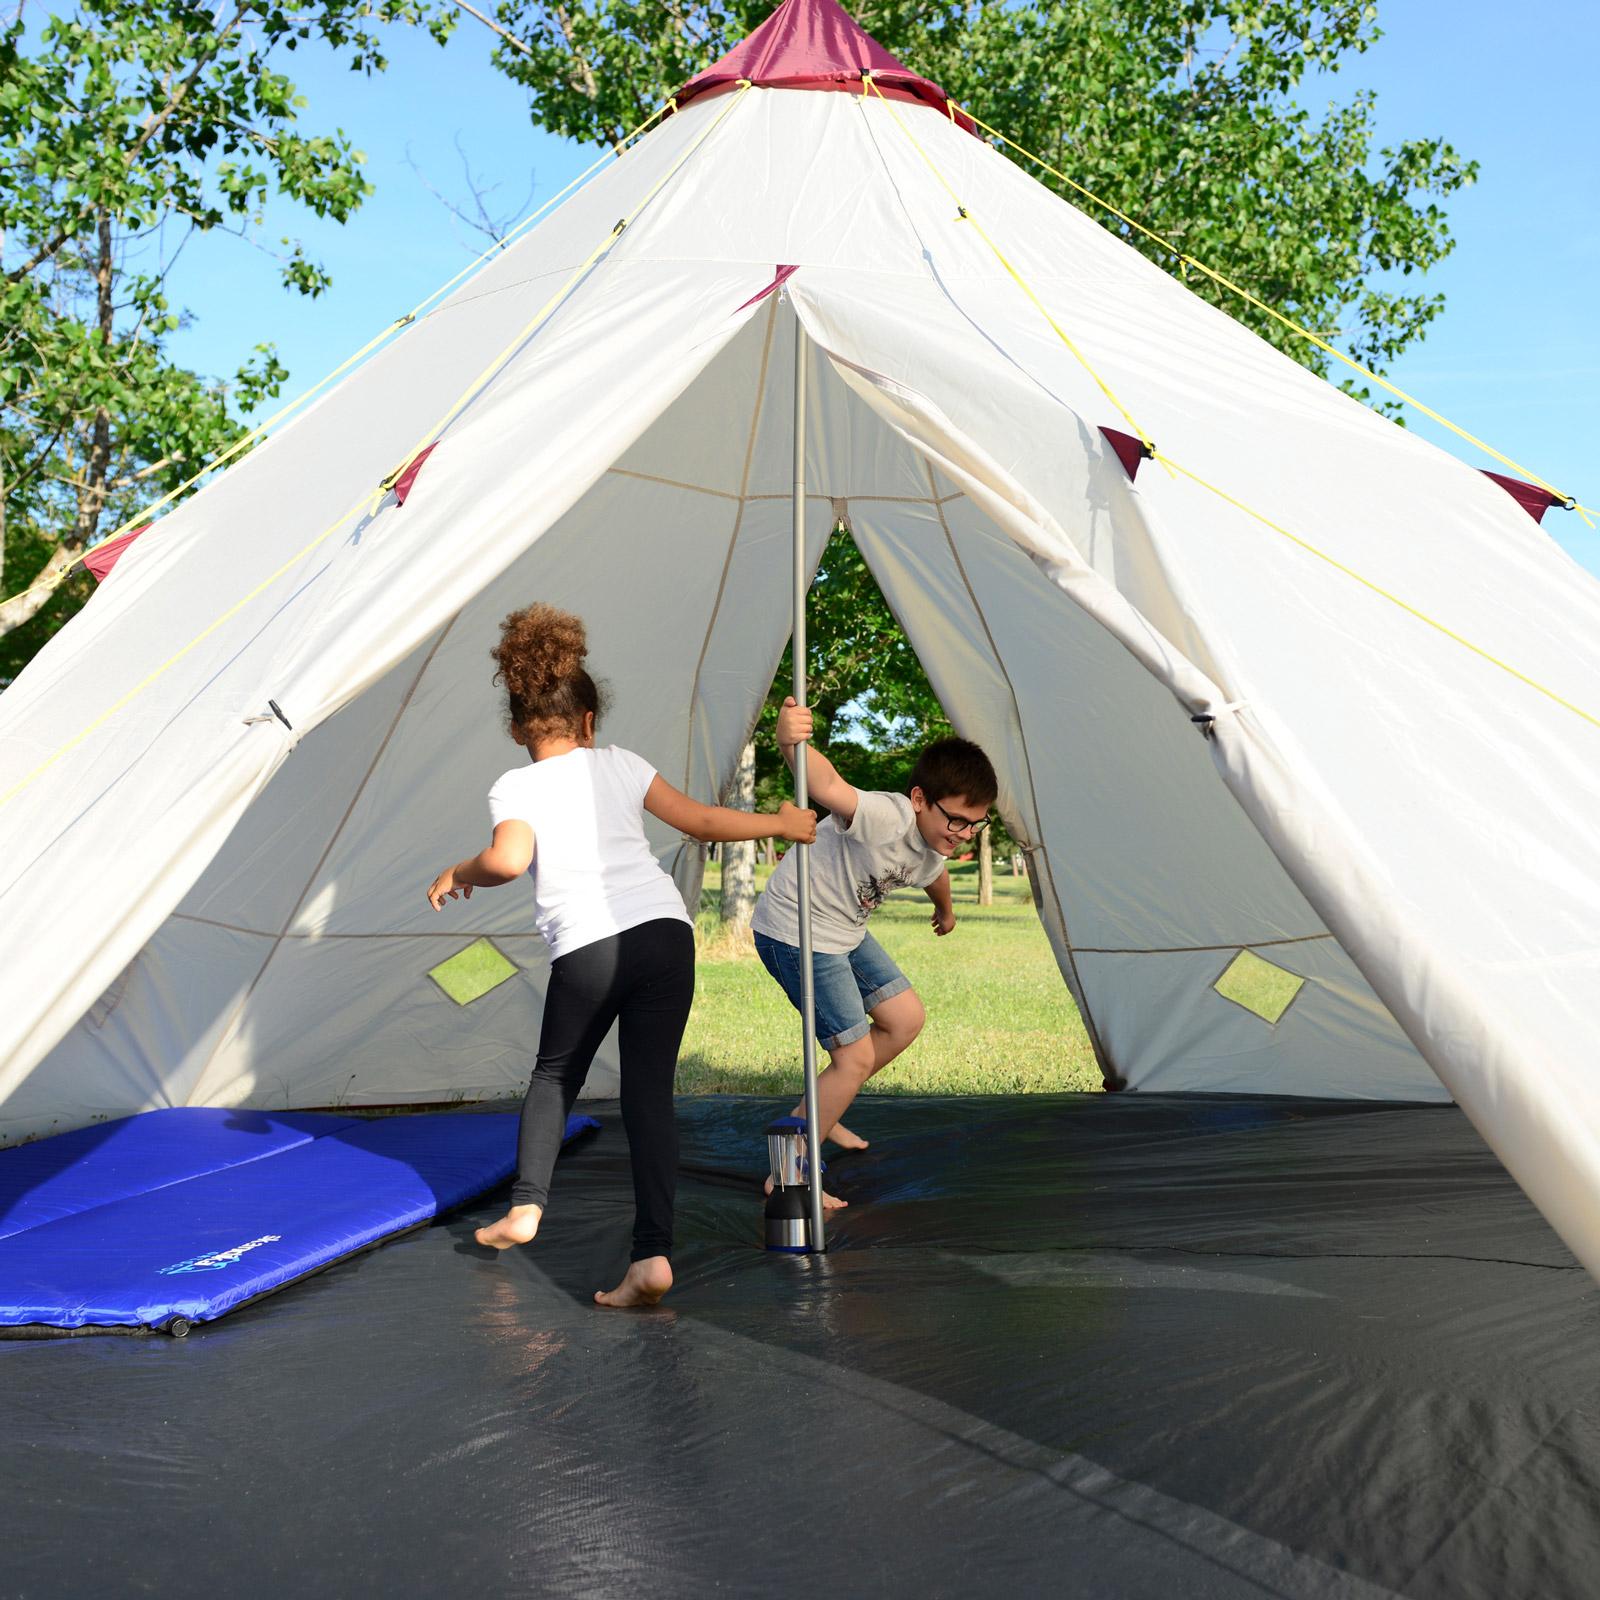 skandika-Teepee-250-Camping-Party-Festival-Tent-2-5-M-Height-3000mm-Column-New thumbnail 4